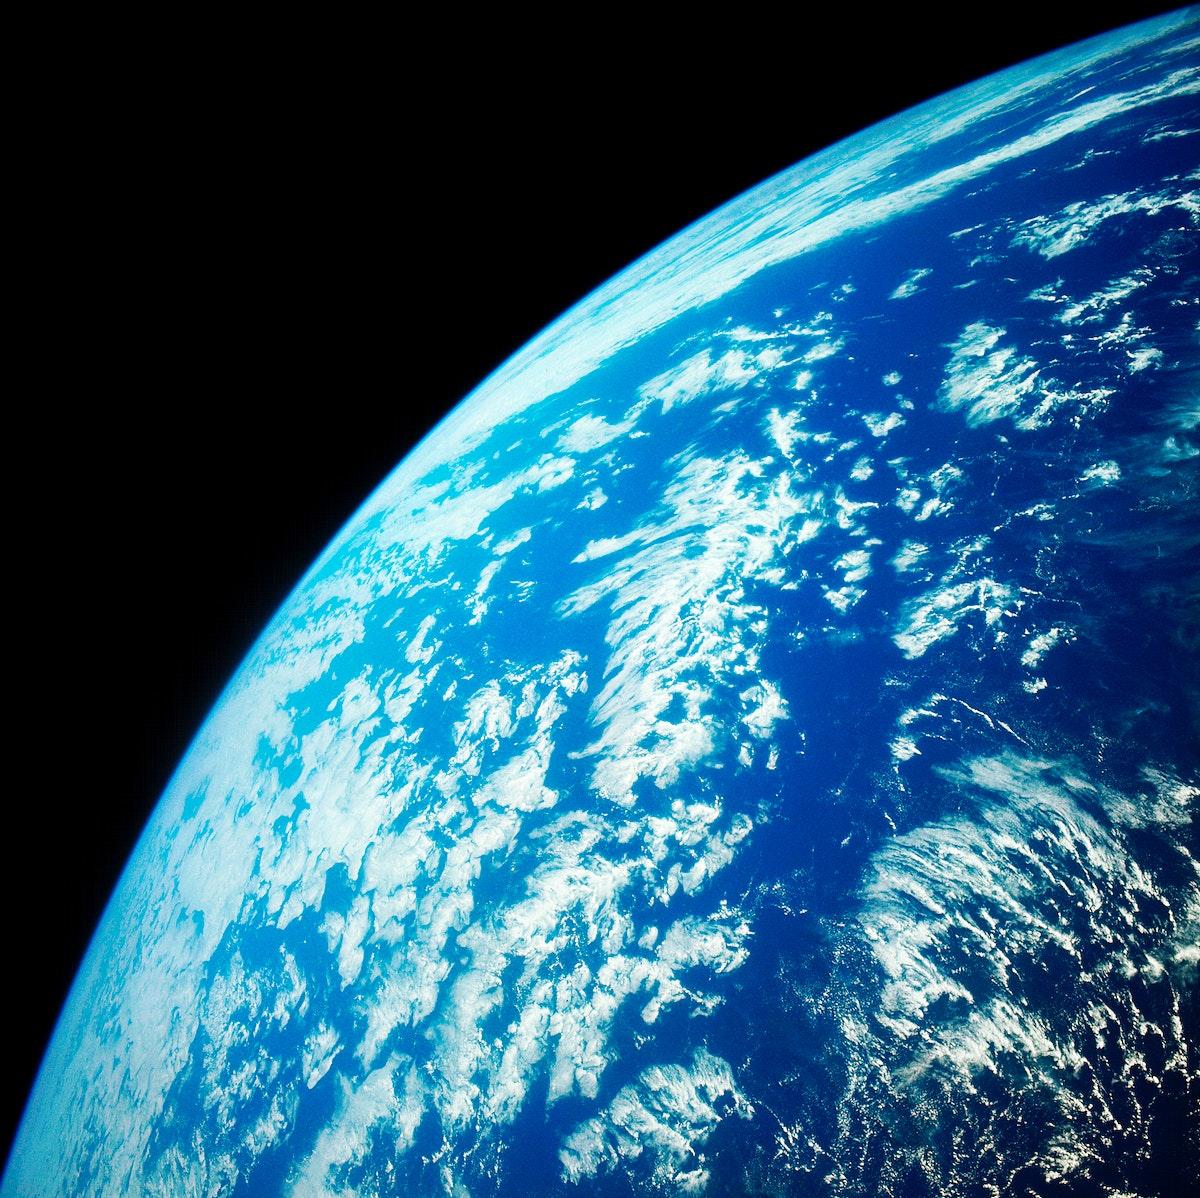 Gemini Titan GT-11 photo of earth sky. Original from NASA. Digitally enhanced by rawpixel.